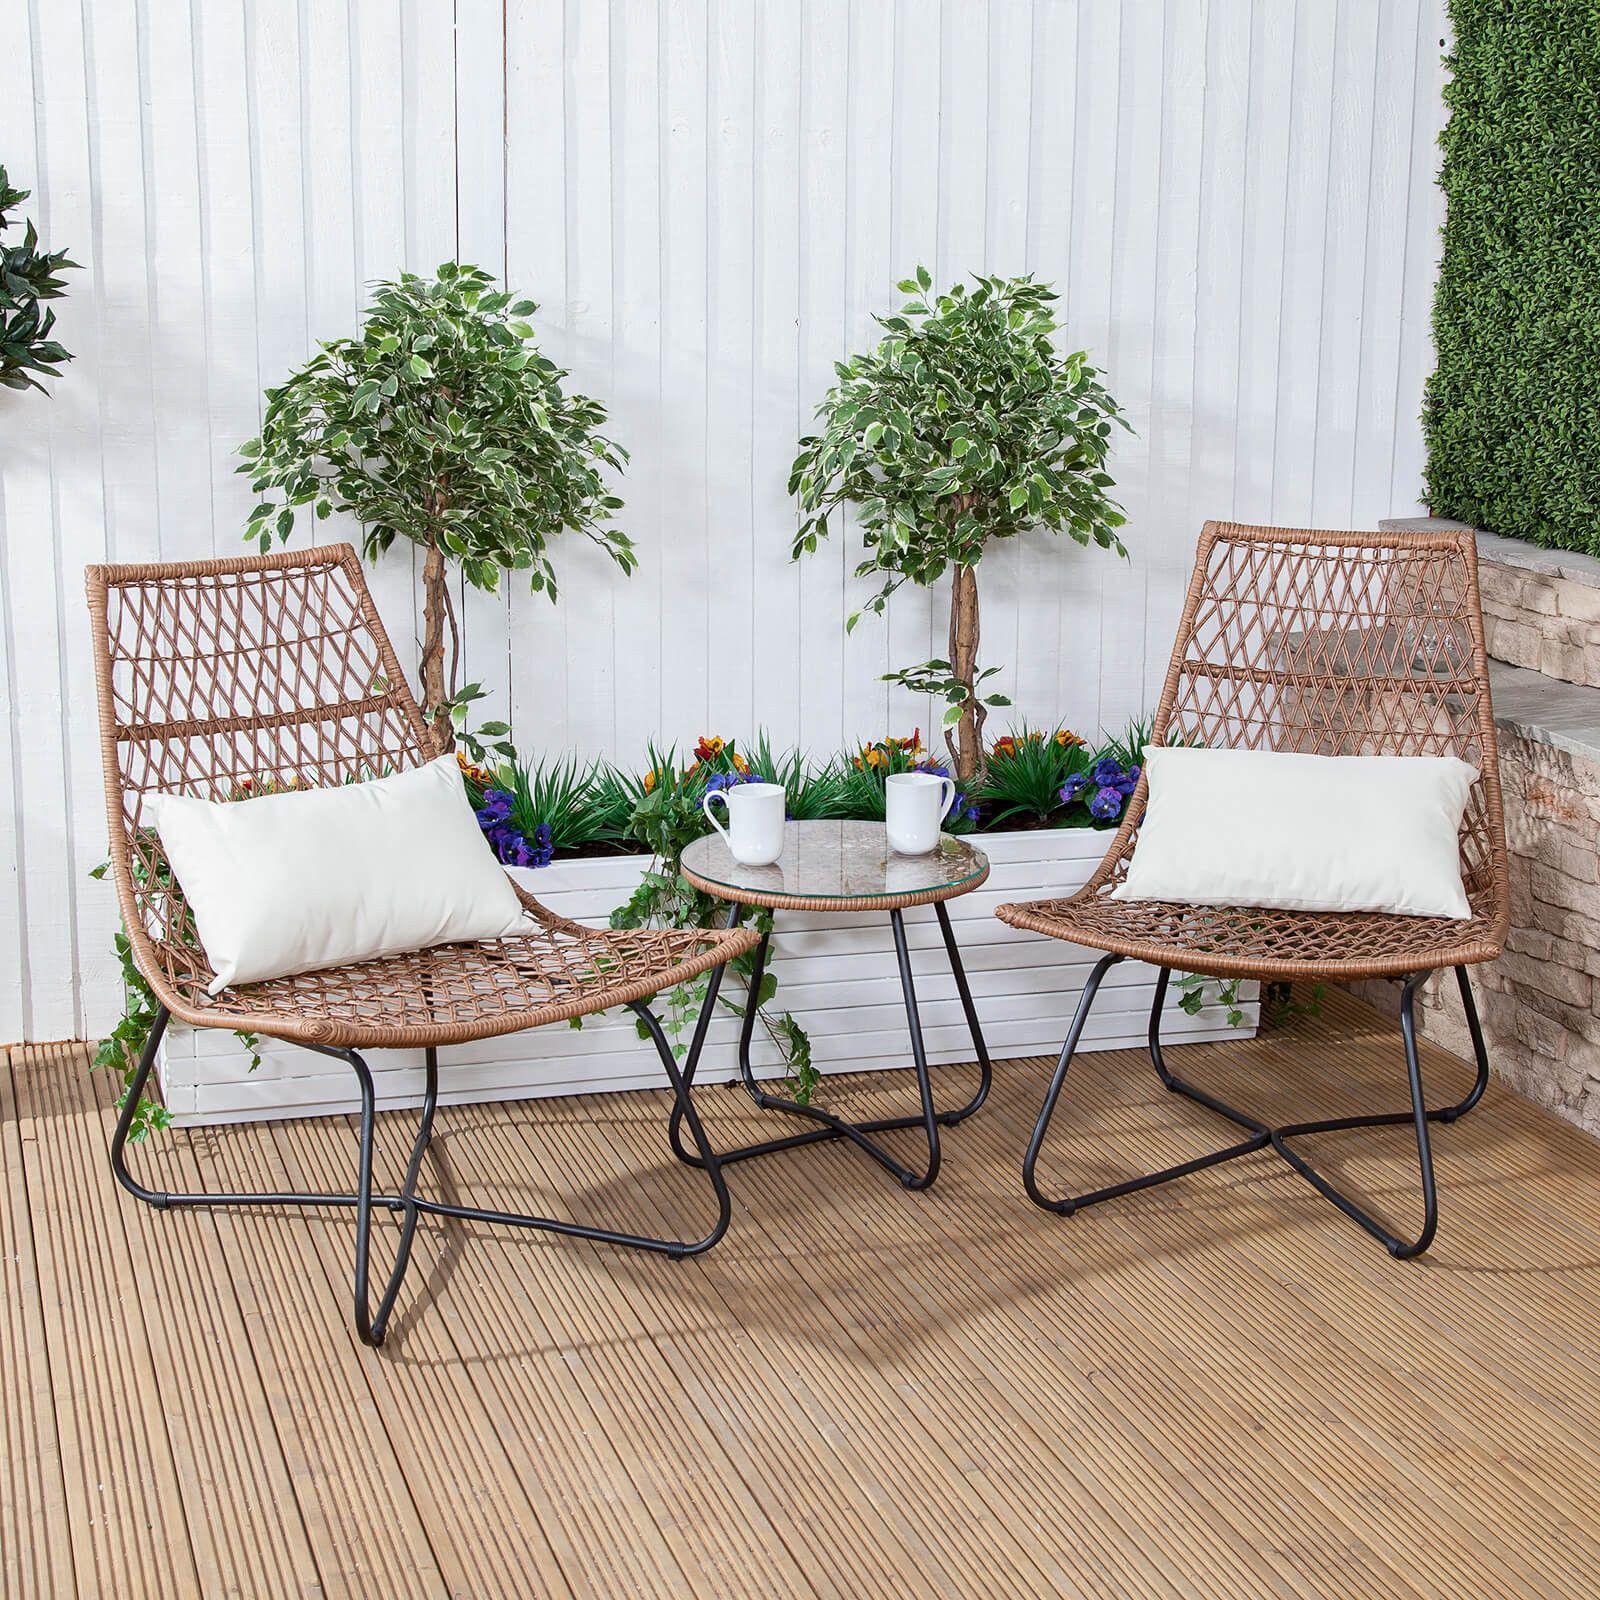 Best Polynesian Bistro Set In 2020 Garden Table Chairs 400 x 300